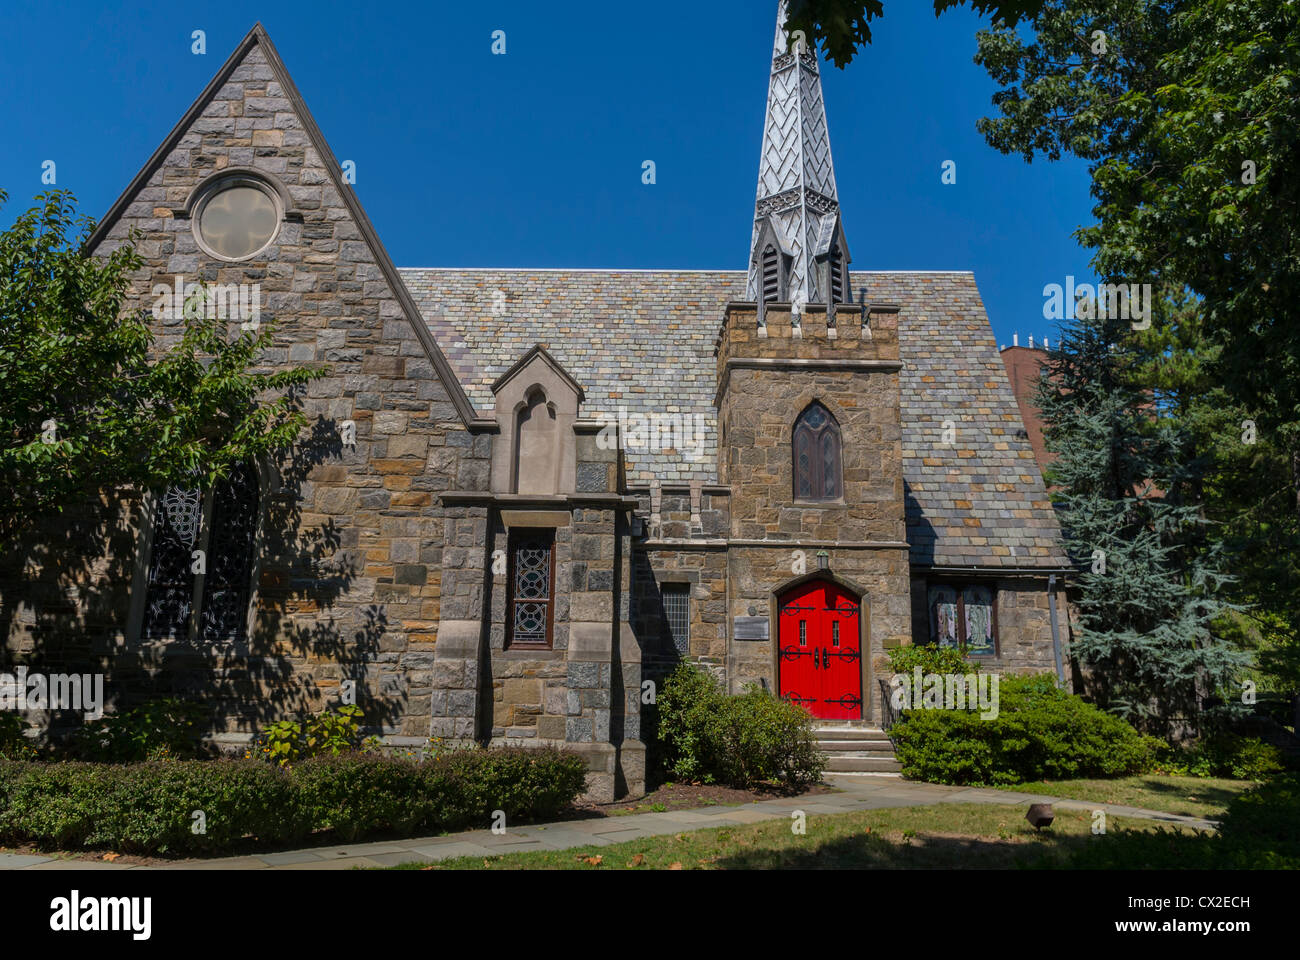 Bronx, New York, NY, USA, Fieldston Historic District, 'Riverdale Presbyterian Church', Front Door, Entrance, - Stock Image